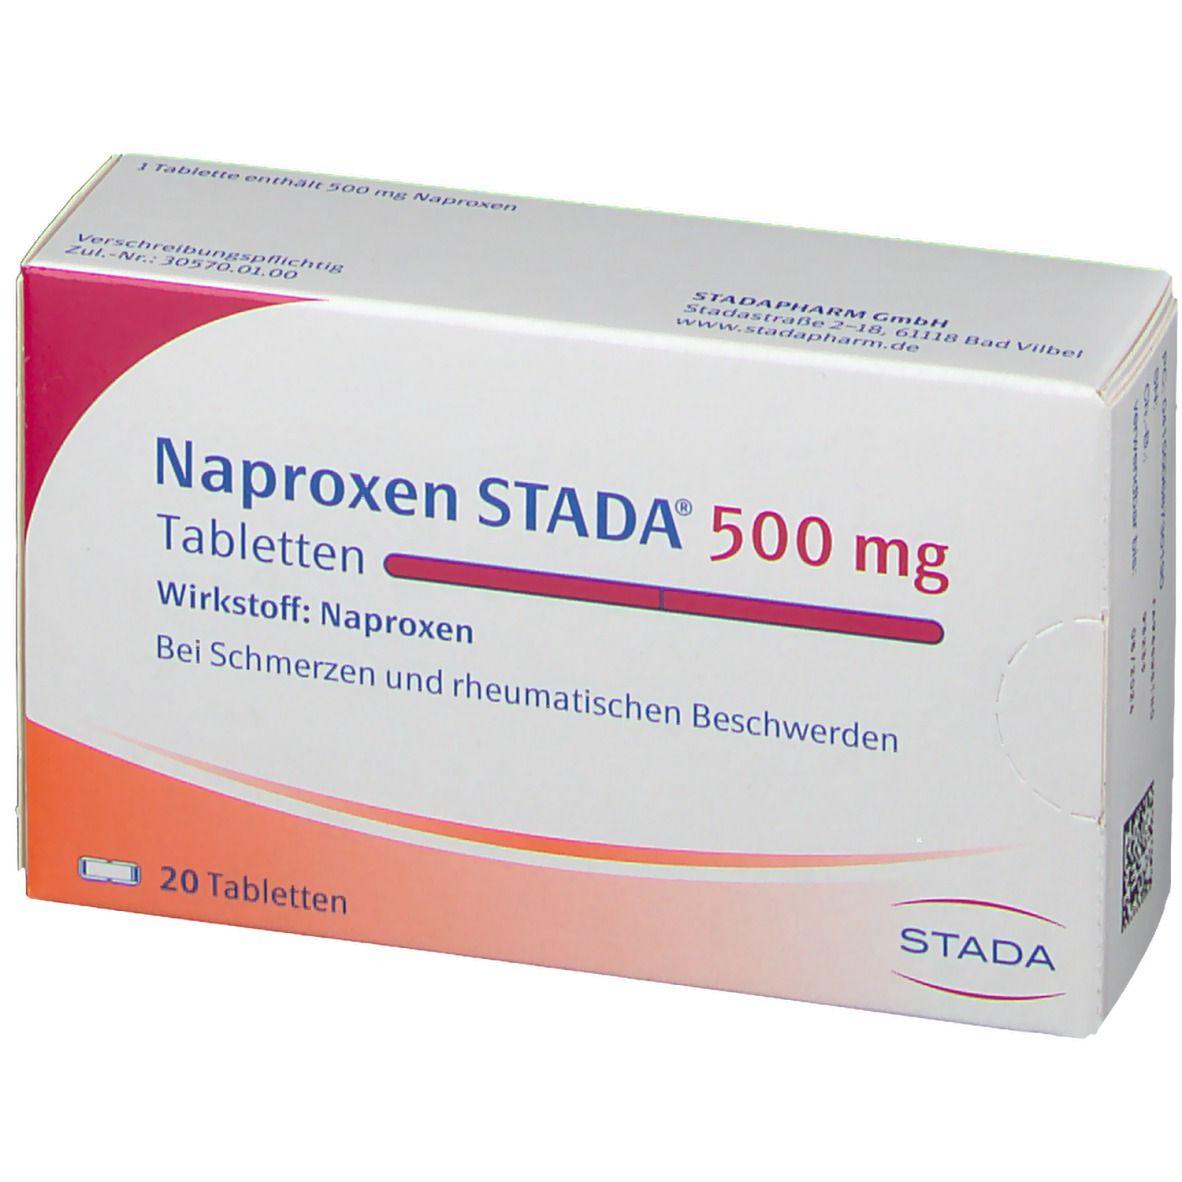 Naproxen STADA® 500 mg